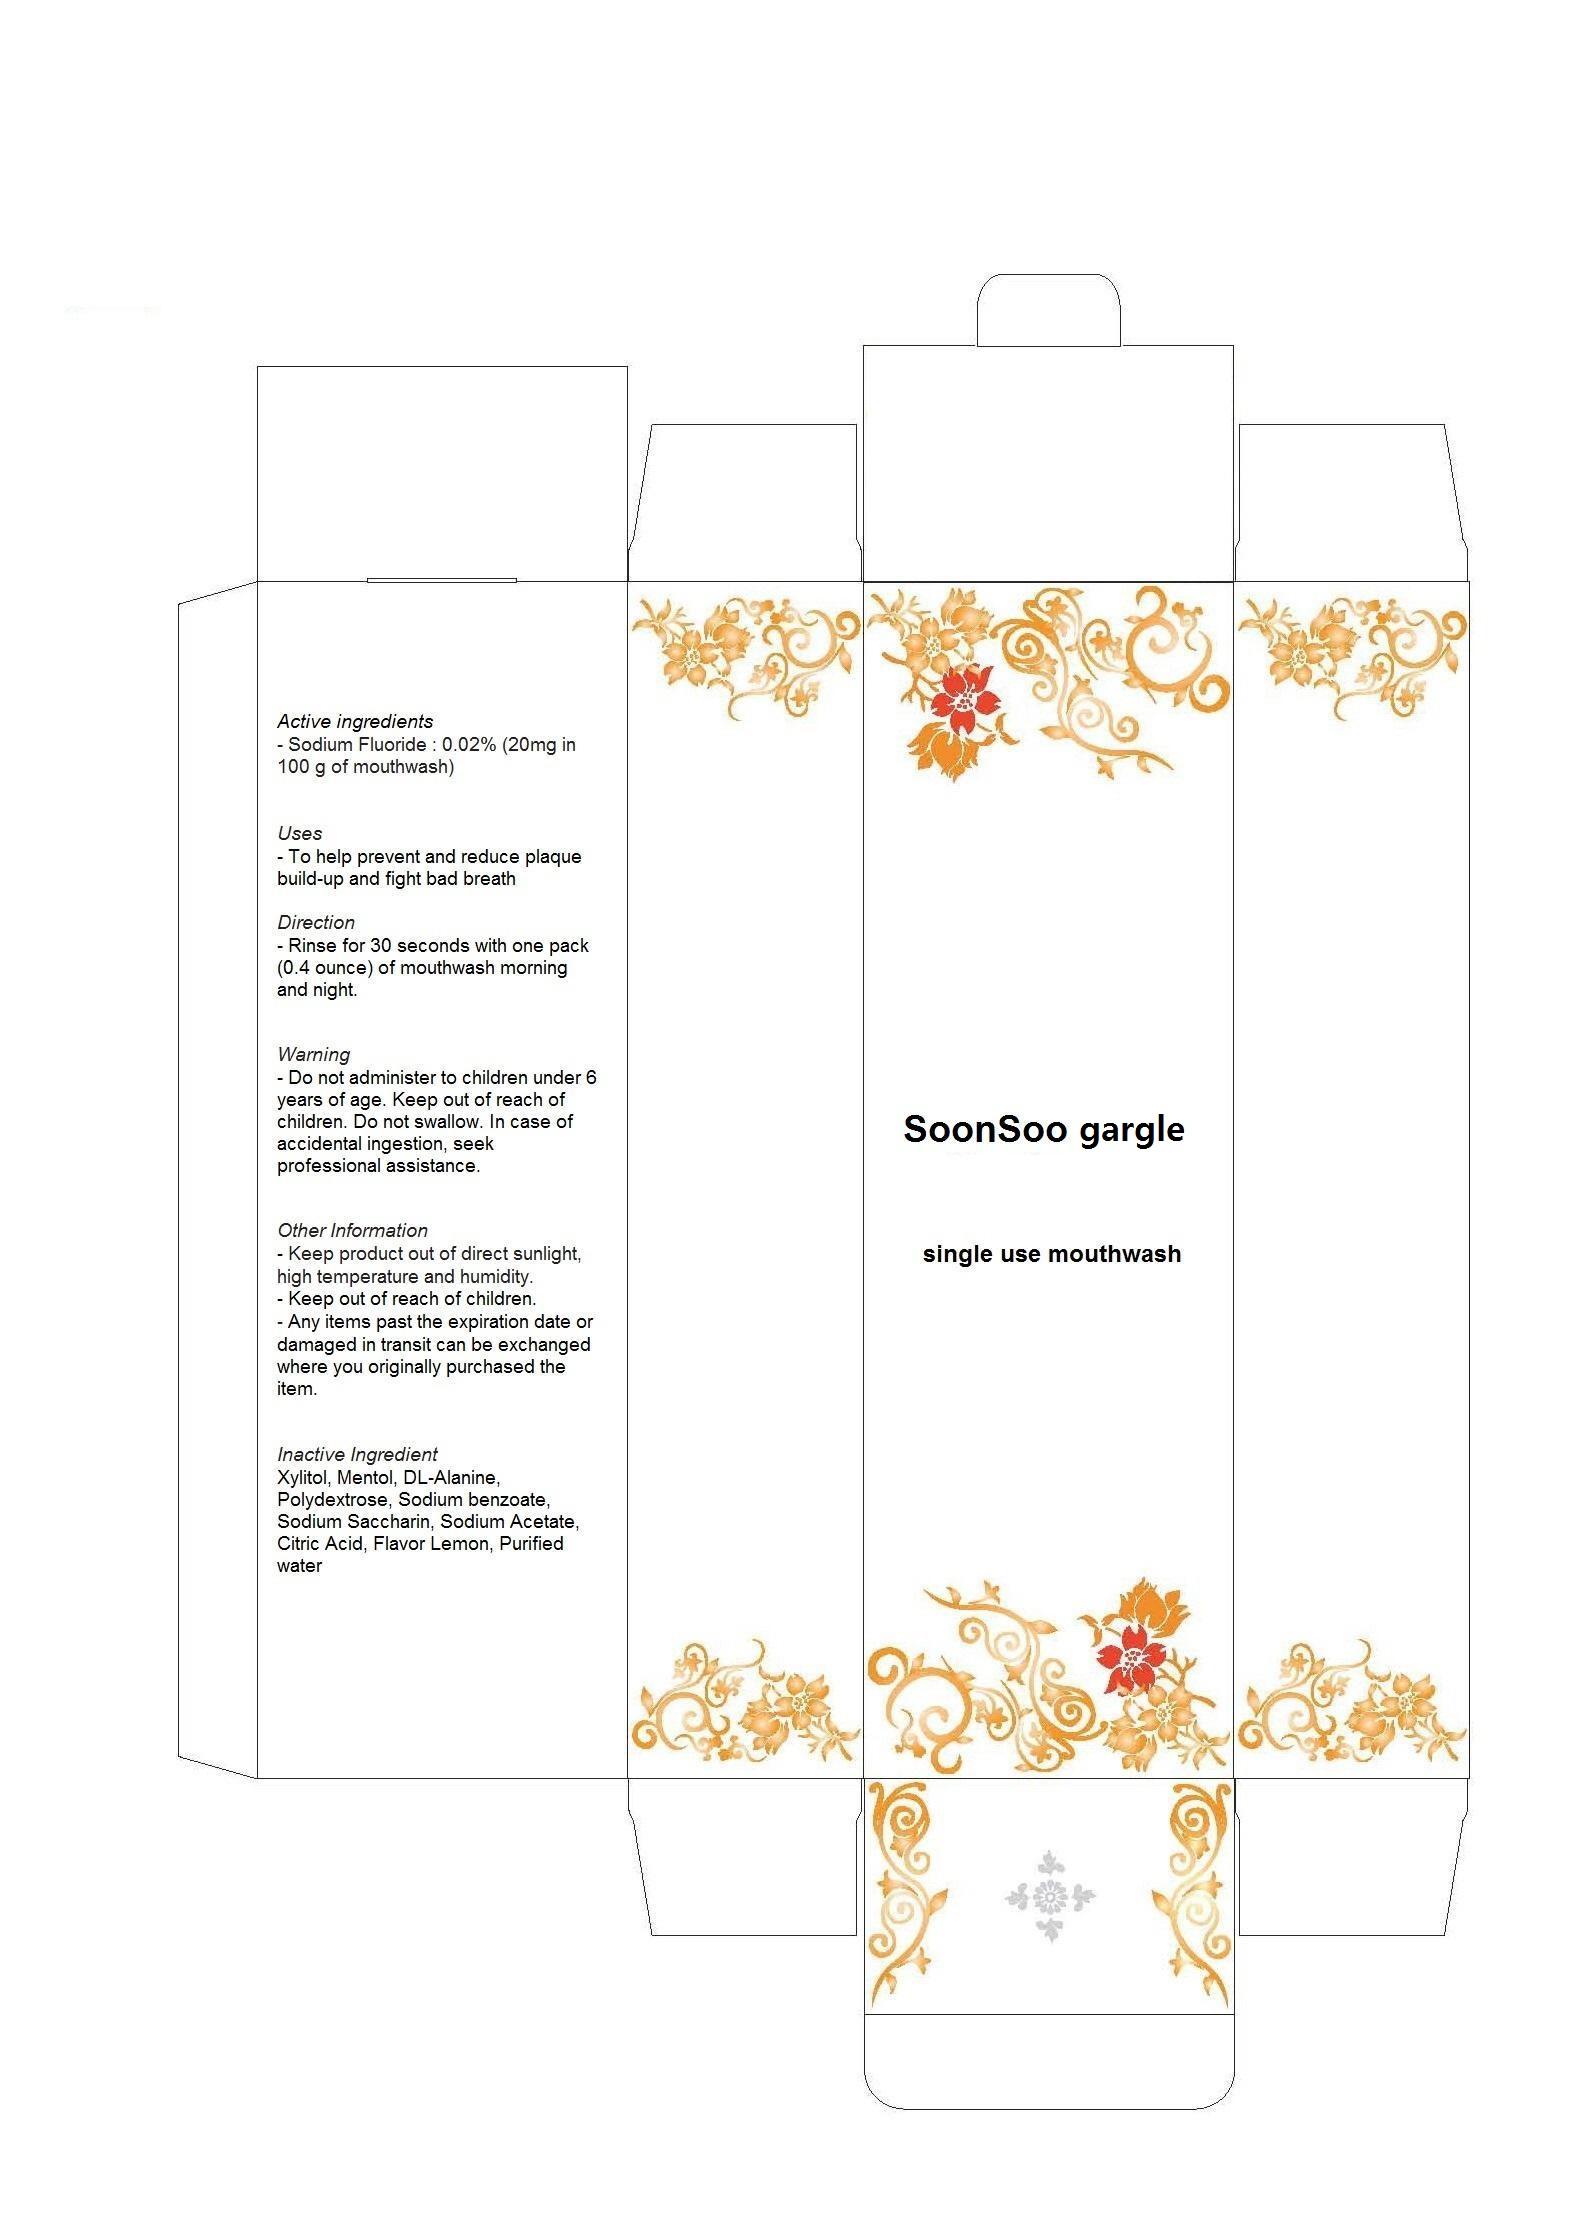 Soonsoo Gargle (Sodium Fluoride) Mouthwash [Chang Hwa Dang Co., Ltd.]